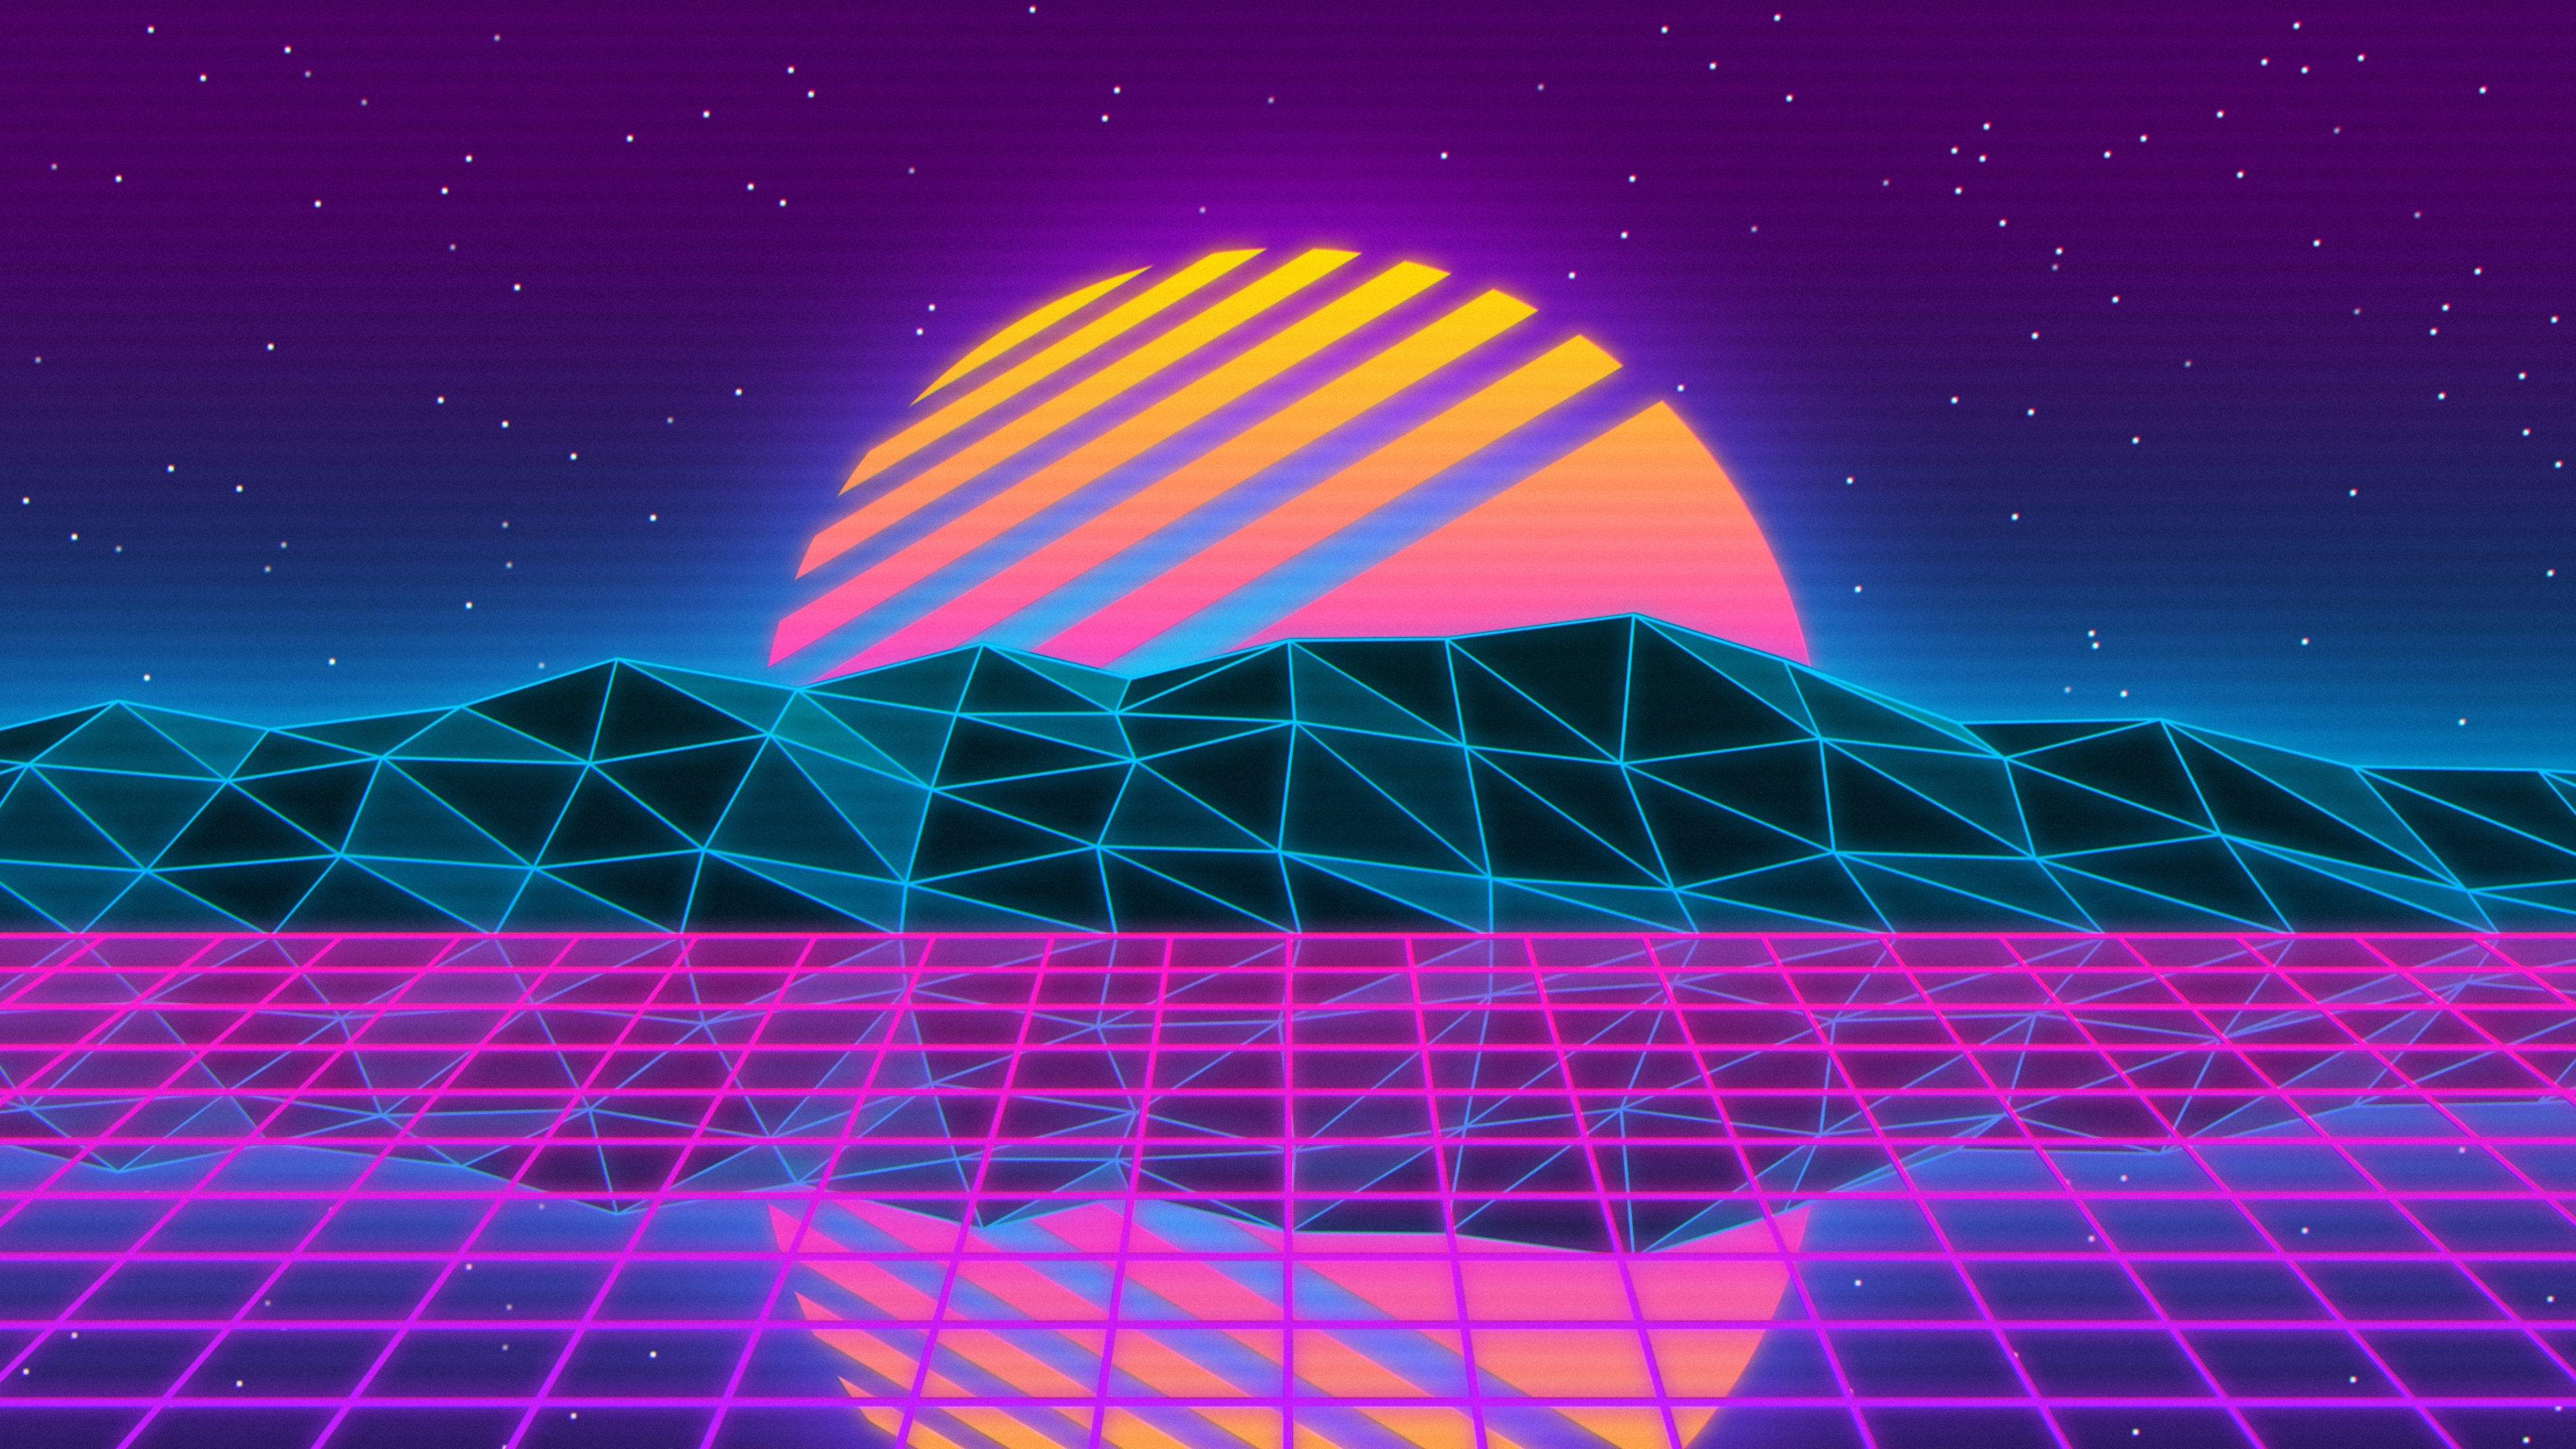 Cyber PC [2560x1440] wallpaper 3840x2160